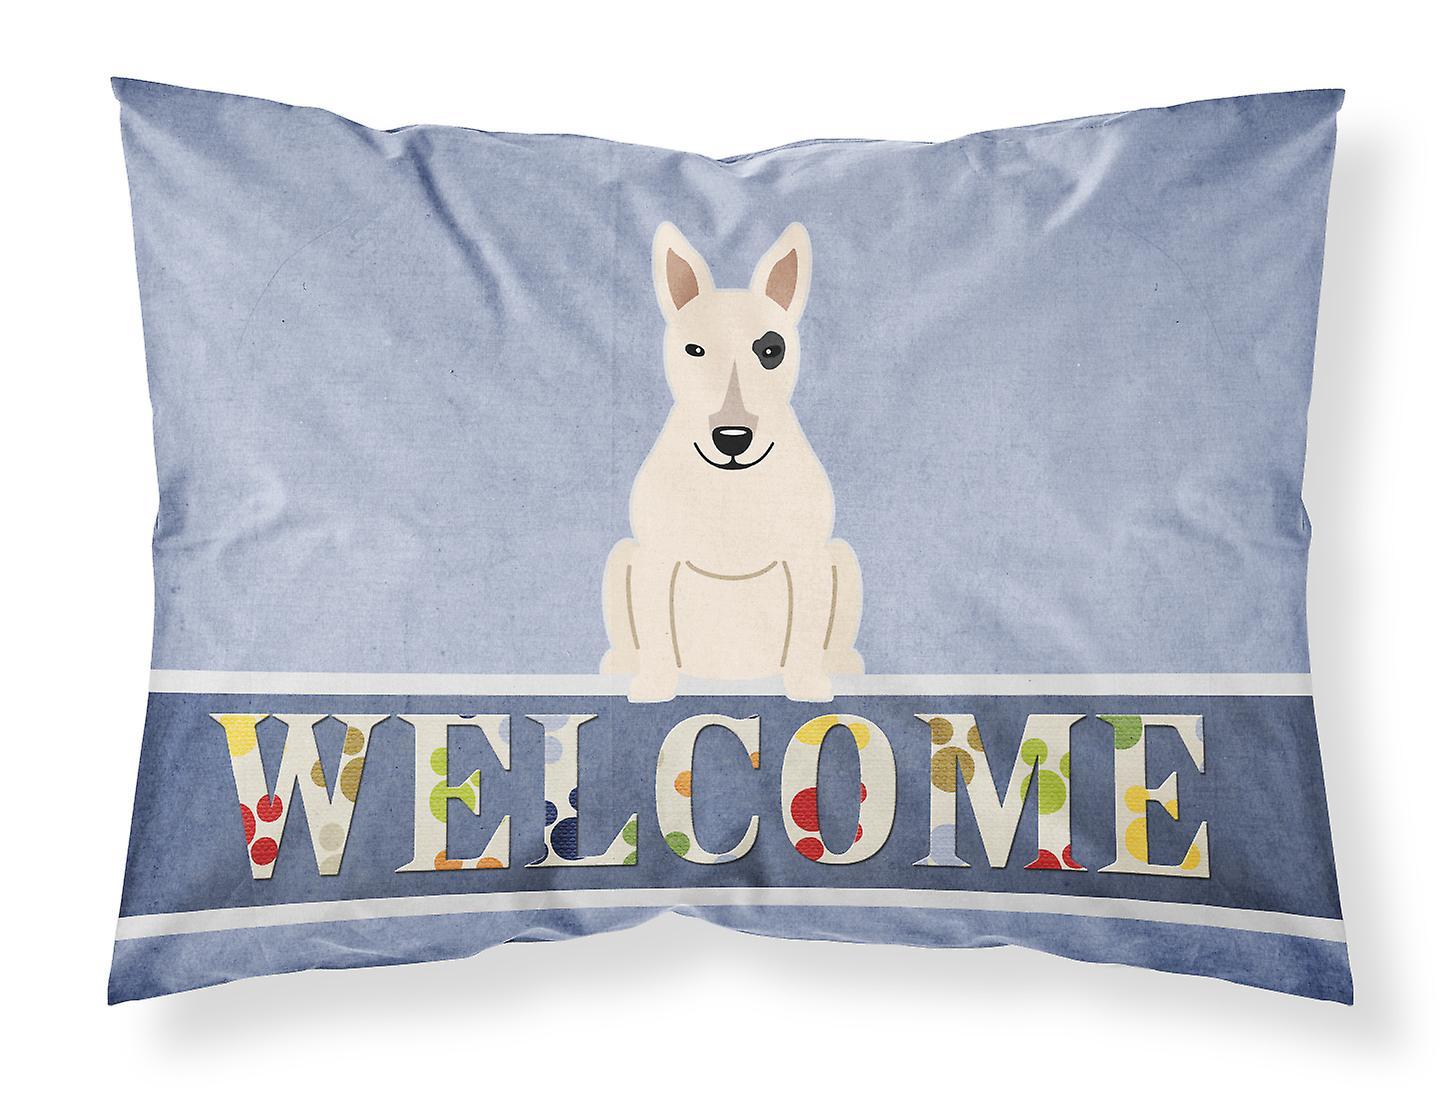 Bienvenue D'oreiller Bull Terrier Tissu Standard Blanc Taie Pour rdxBeWoC